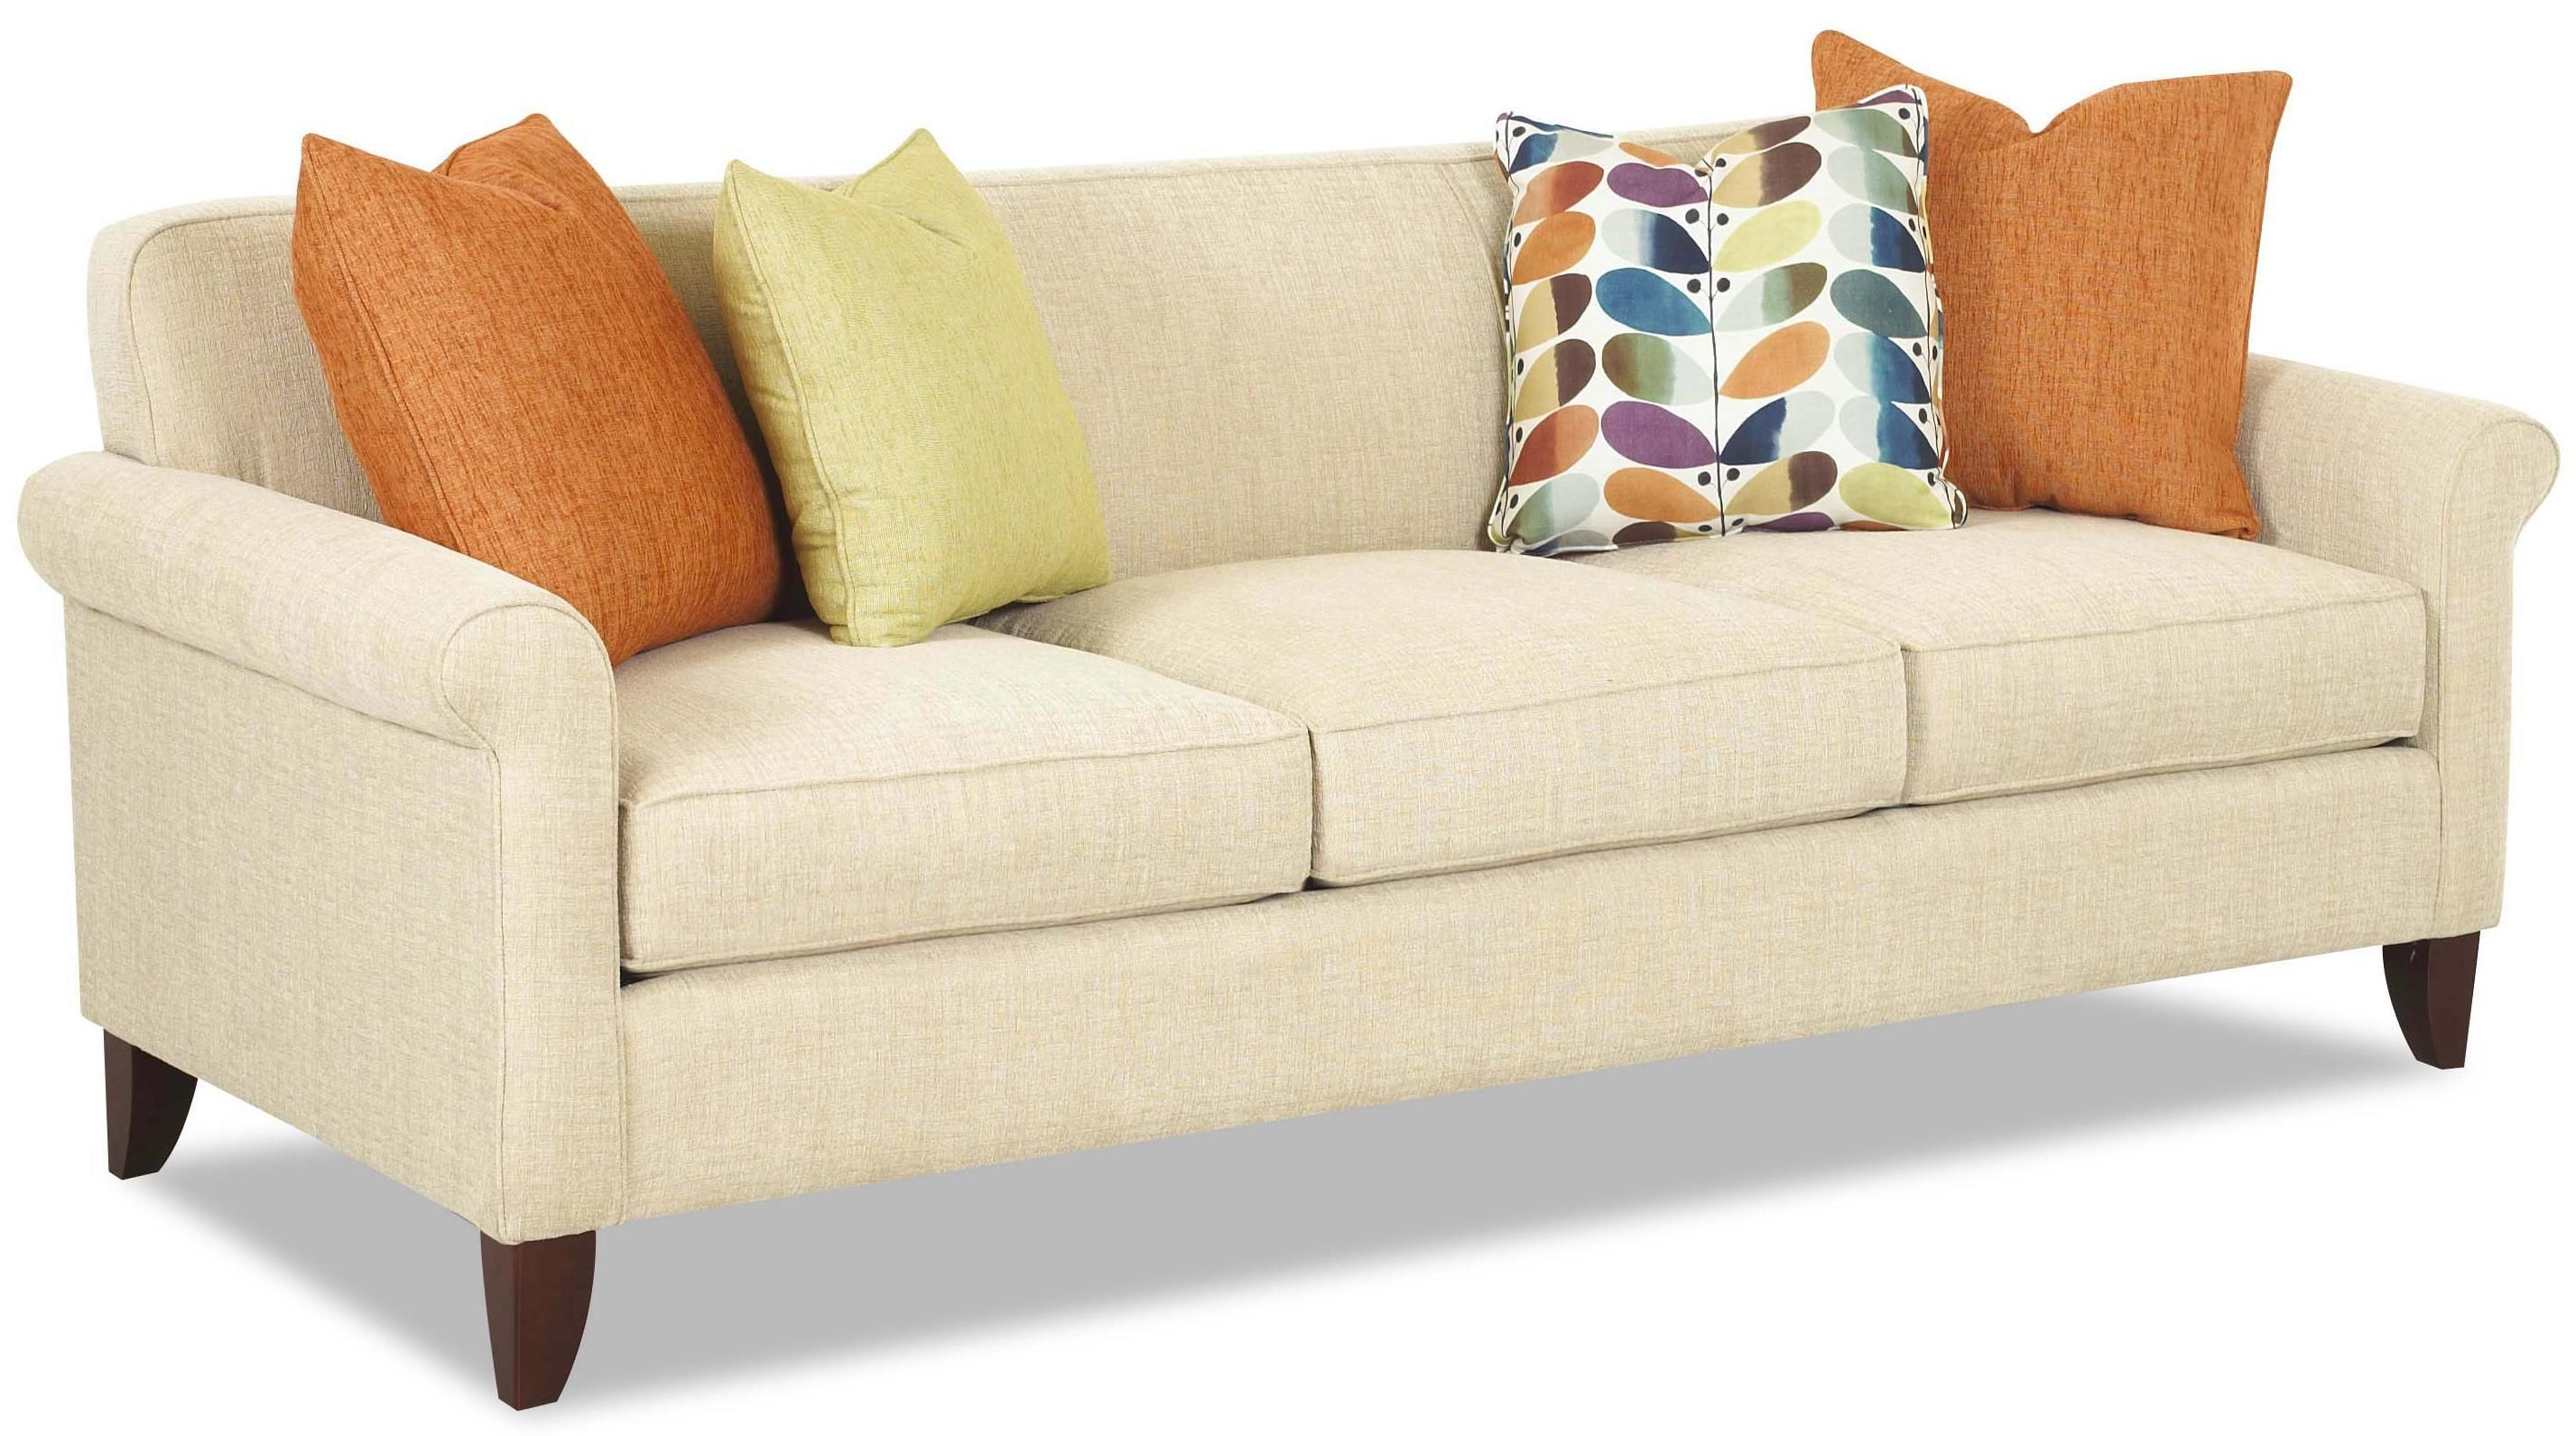 emmie sofa by belfort basics my new house pinterest rh co pinterest com